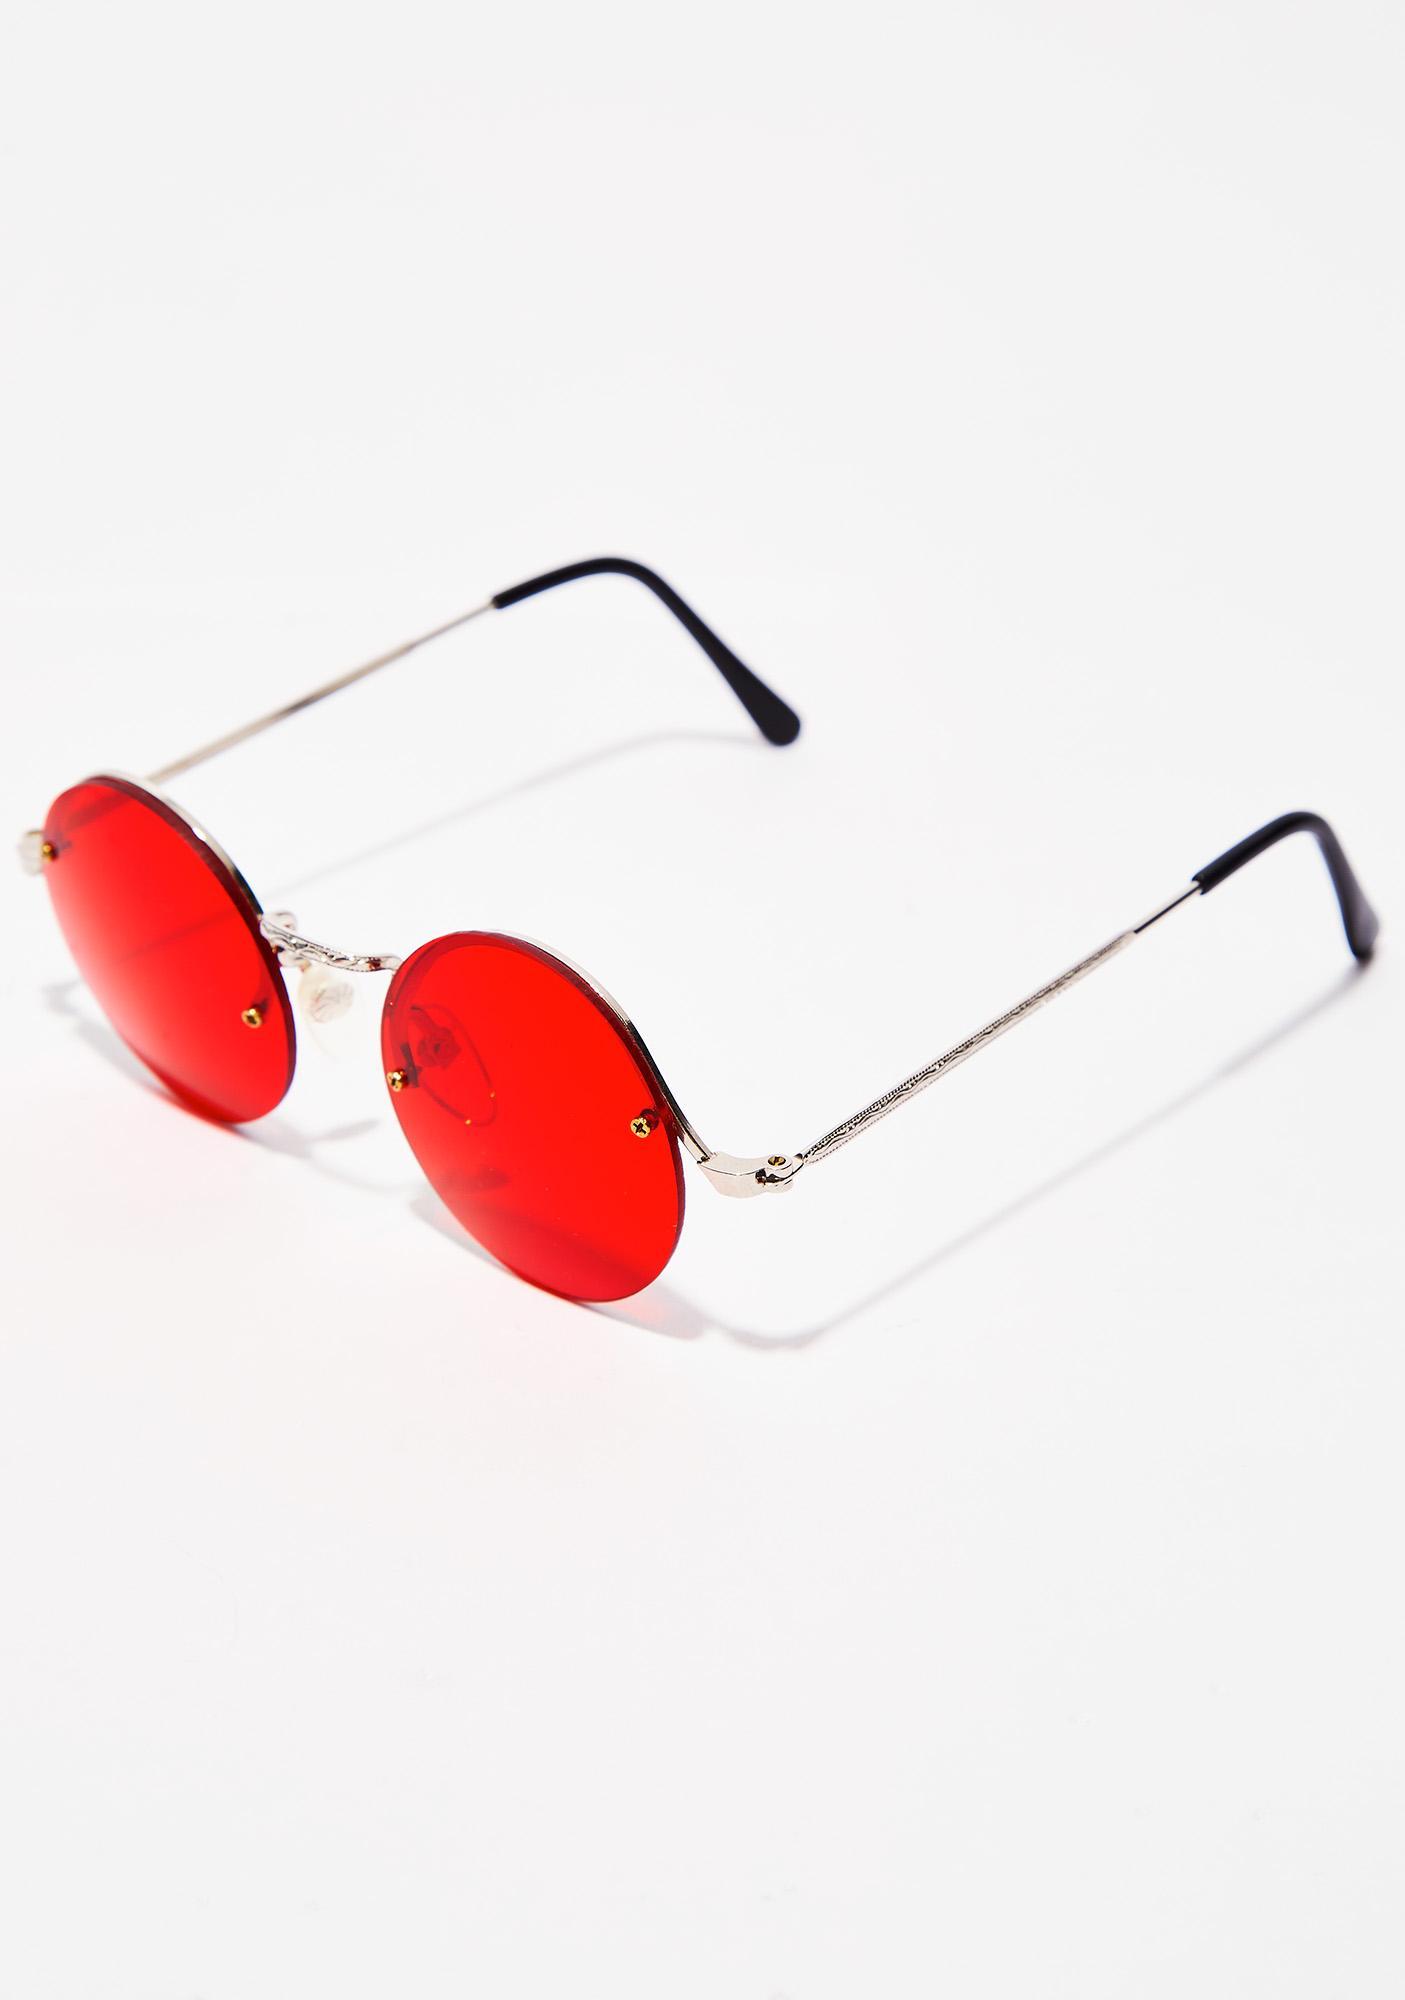 Groovy Gal Round Sunglasses